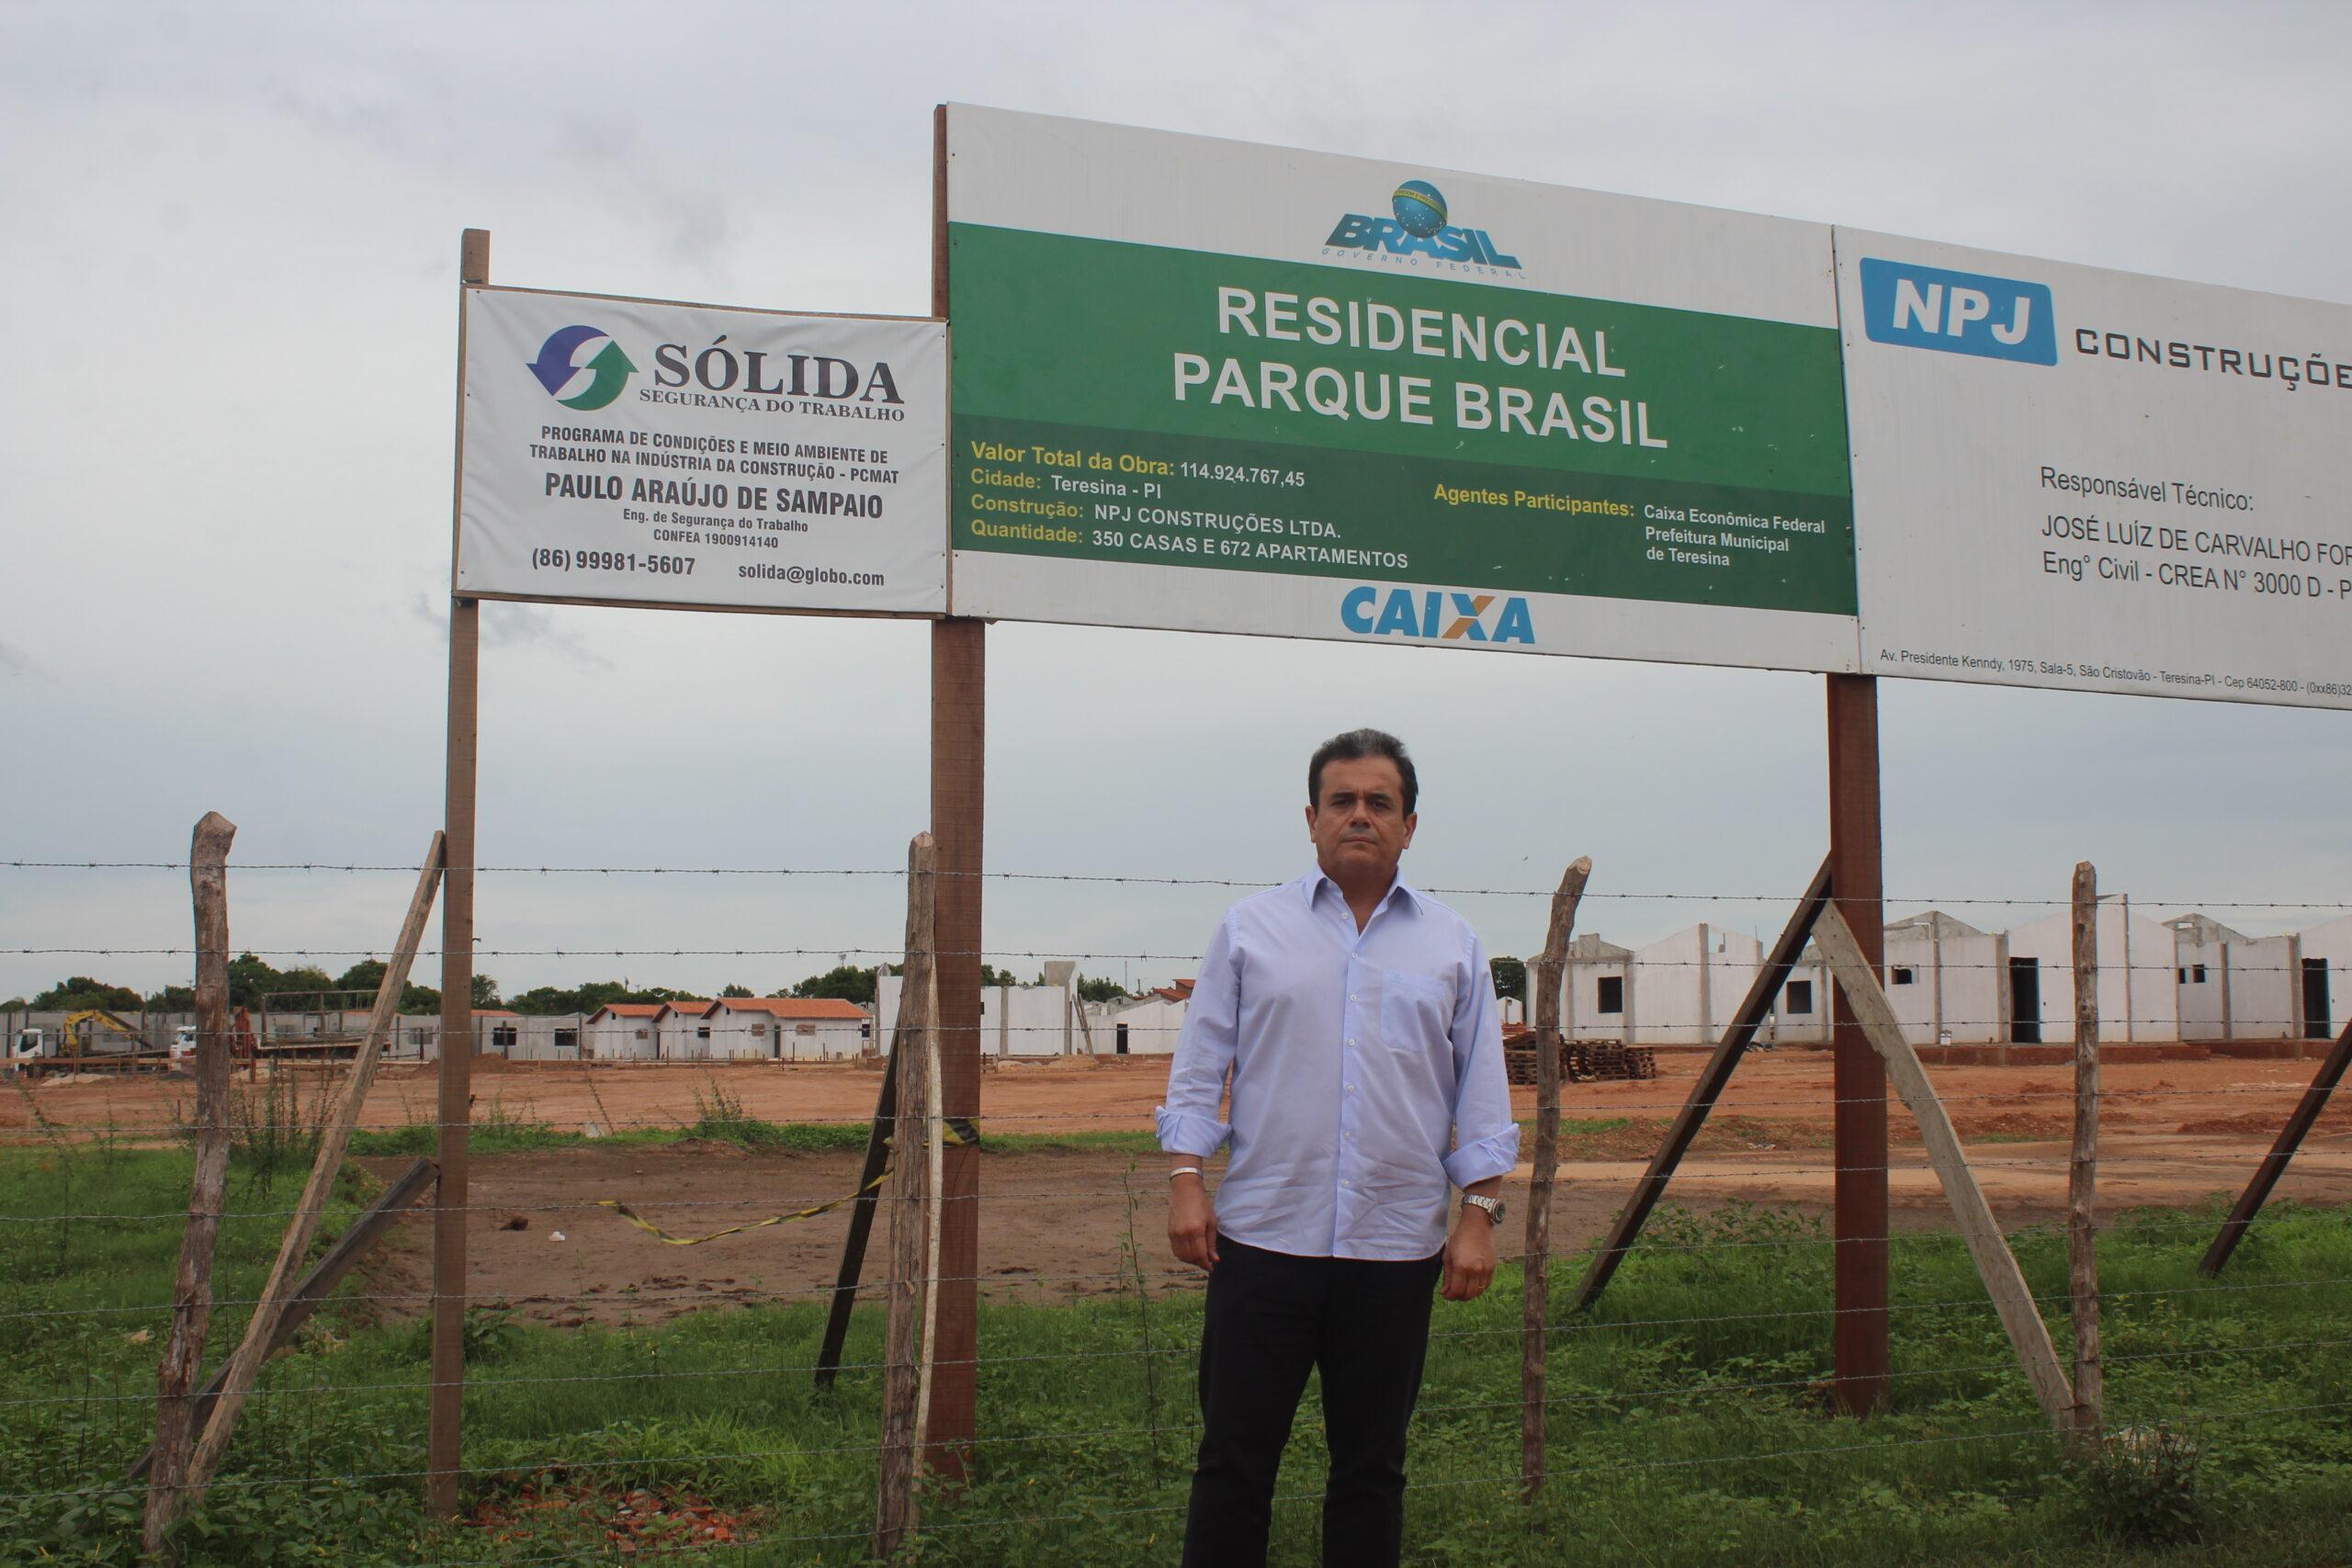 Obra do residencial Parque Brasil teve apoio de Henrique Pires